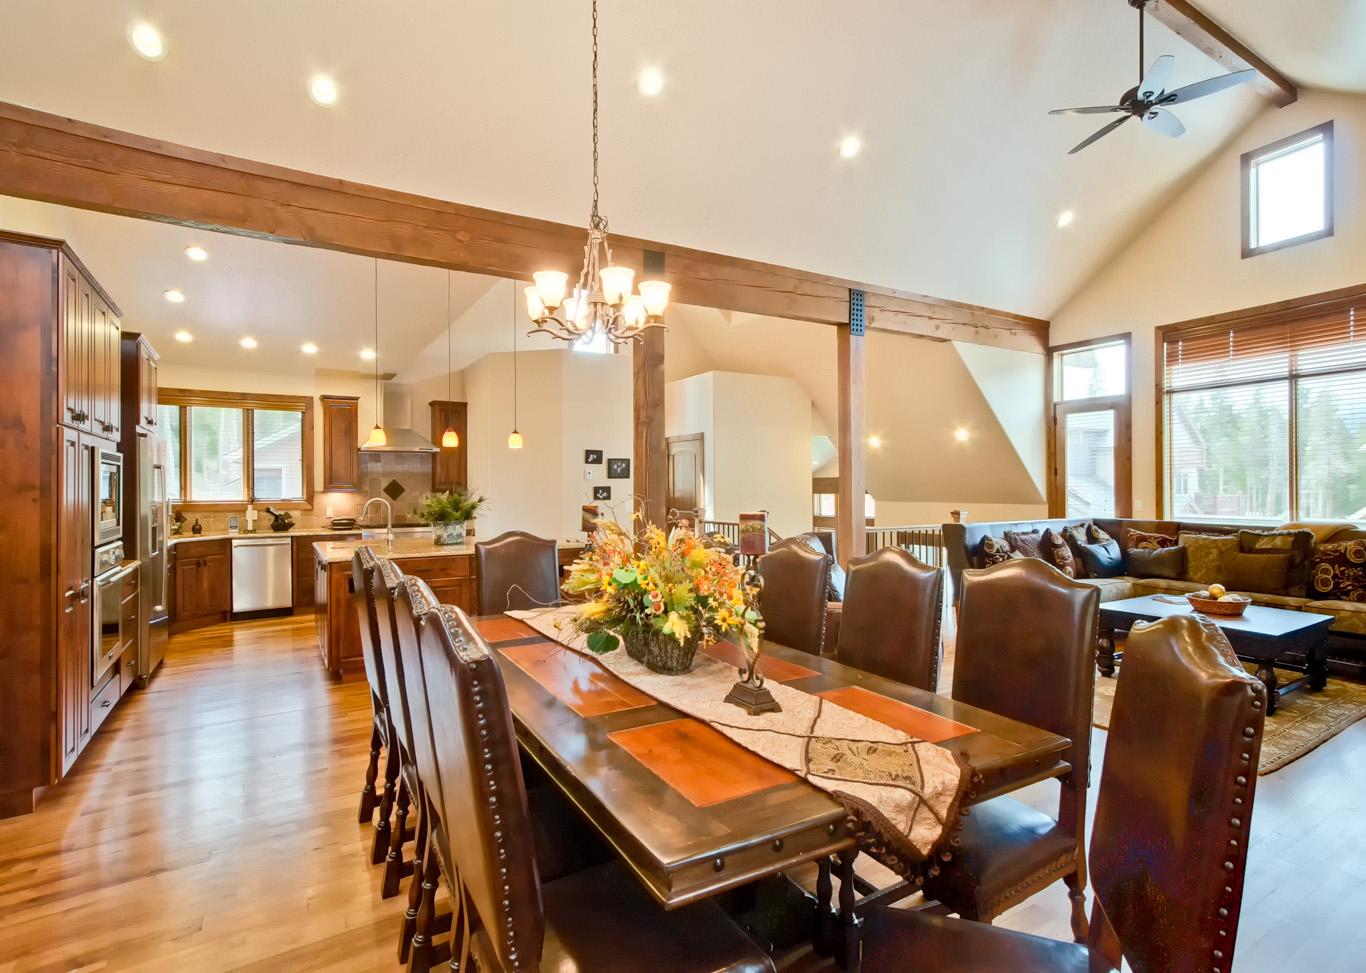 DiningToKitchenWeb Estates at Settlers Creek Real Estate